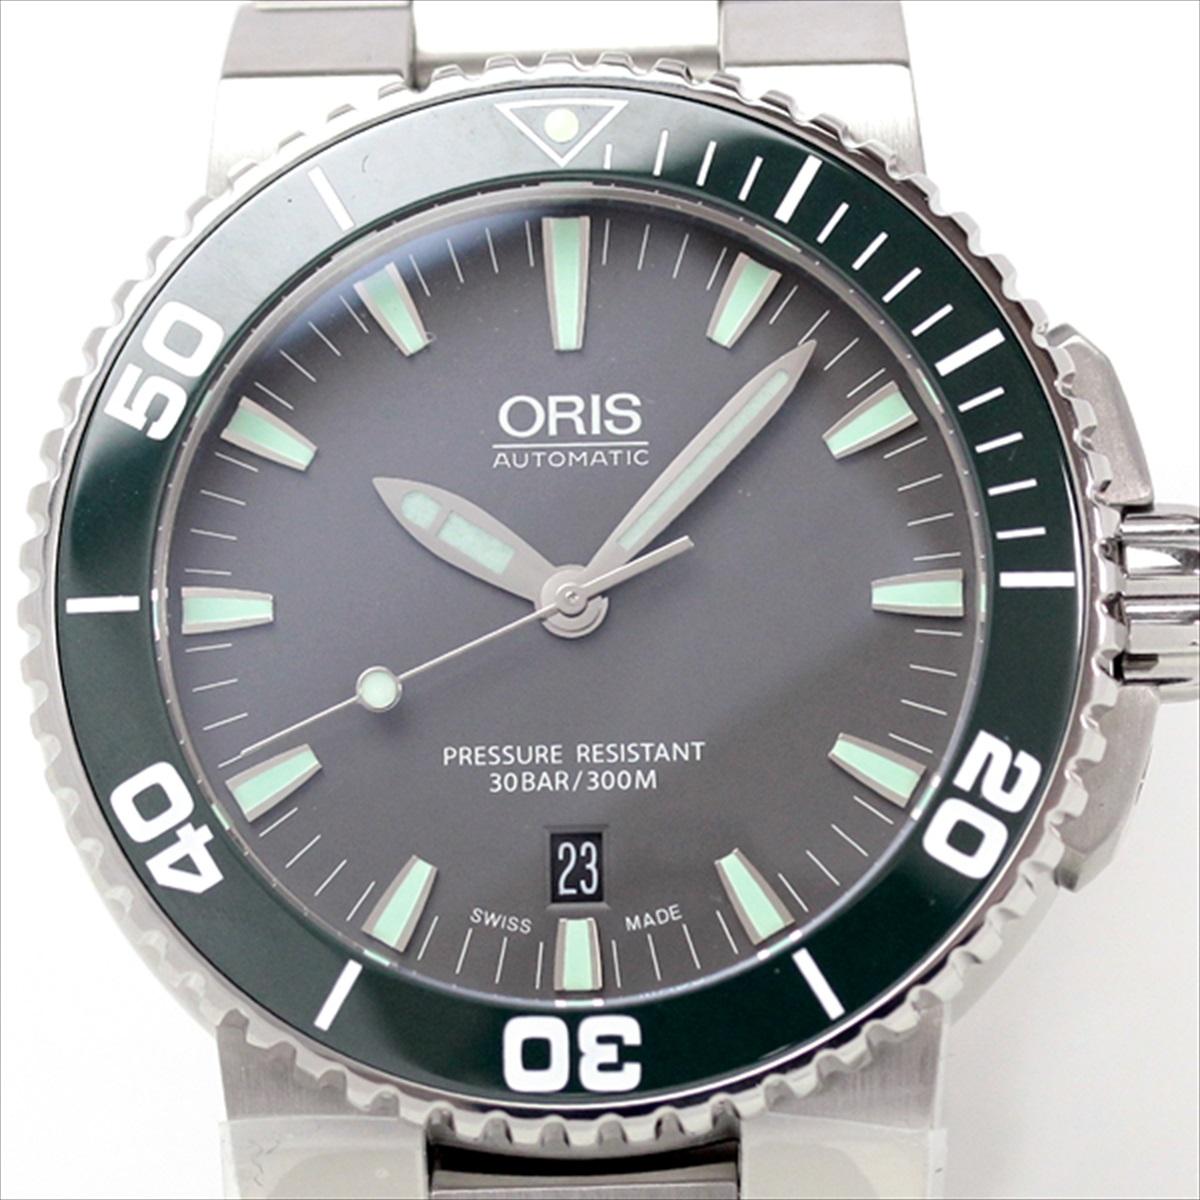 ORIS 腕時計 ダイバーズ グリーンのセラミックベゼル